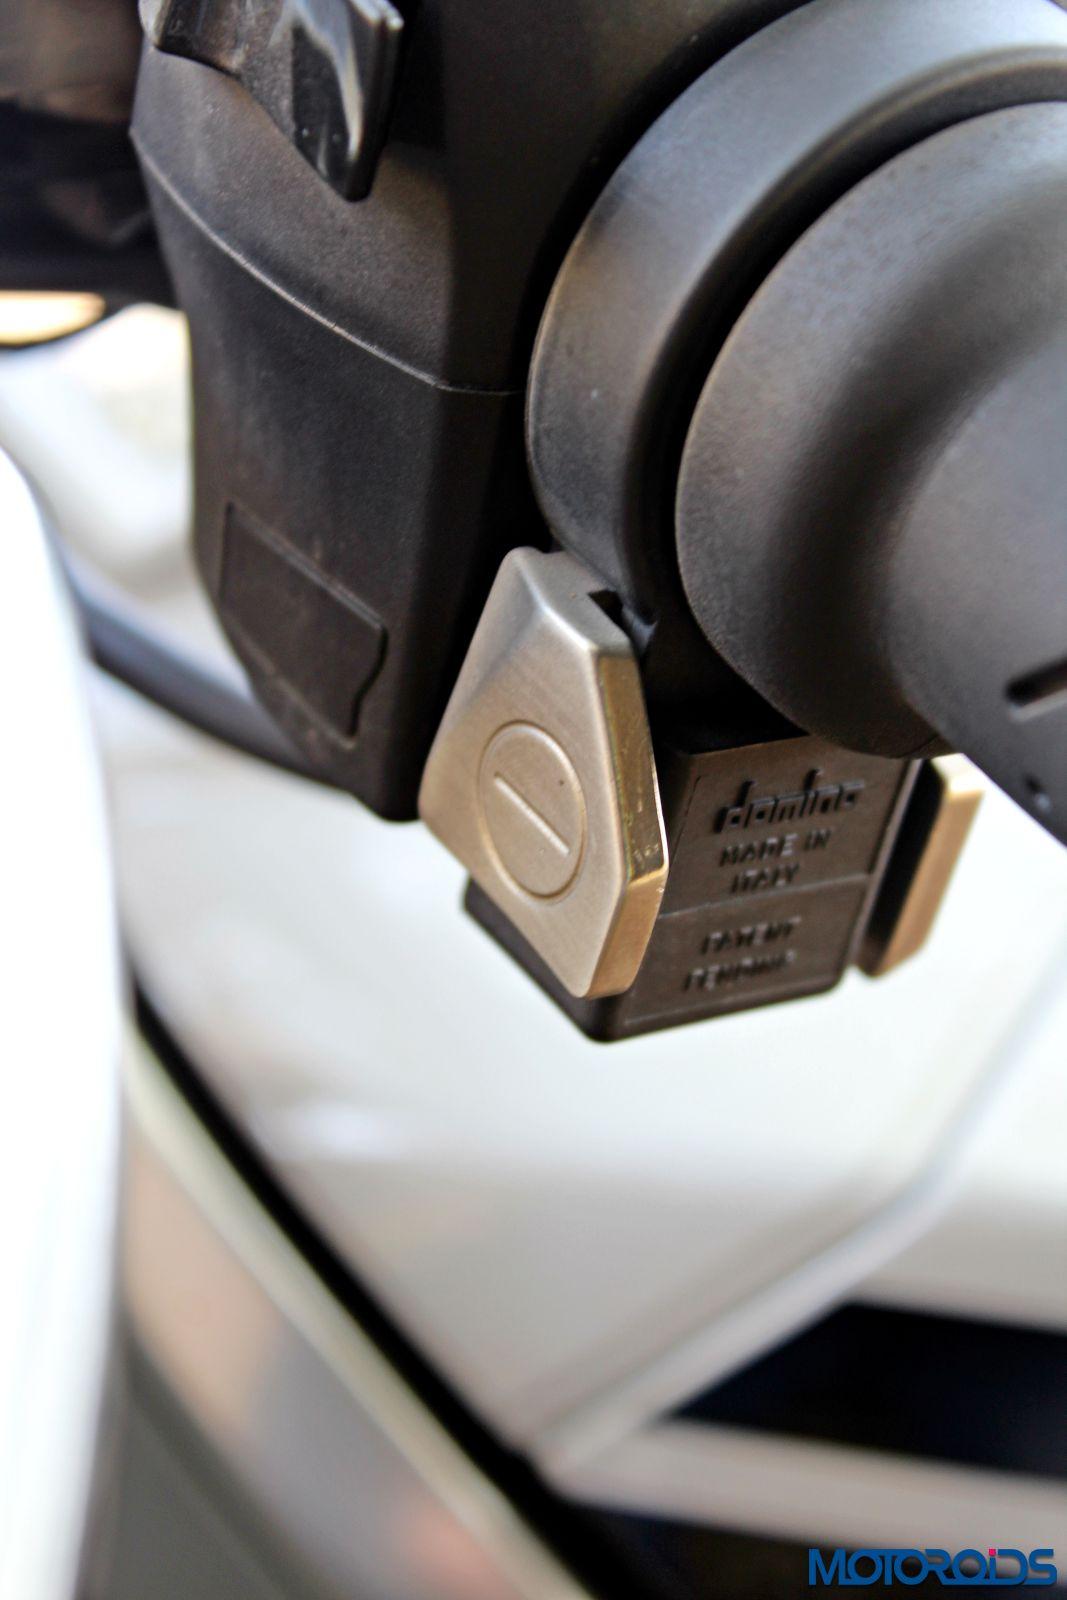 Aprilia Tuono V4 1100 Factory Review - Details and Stills (51)